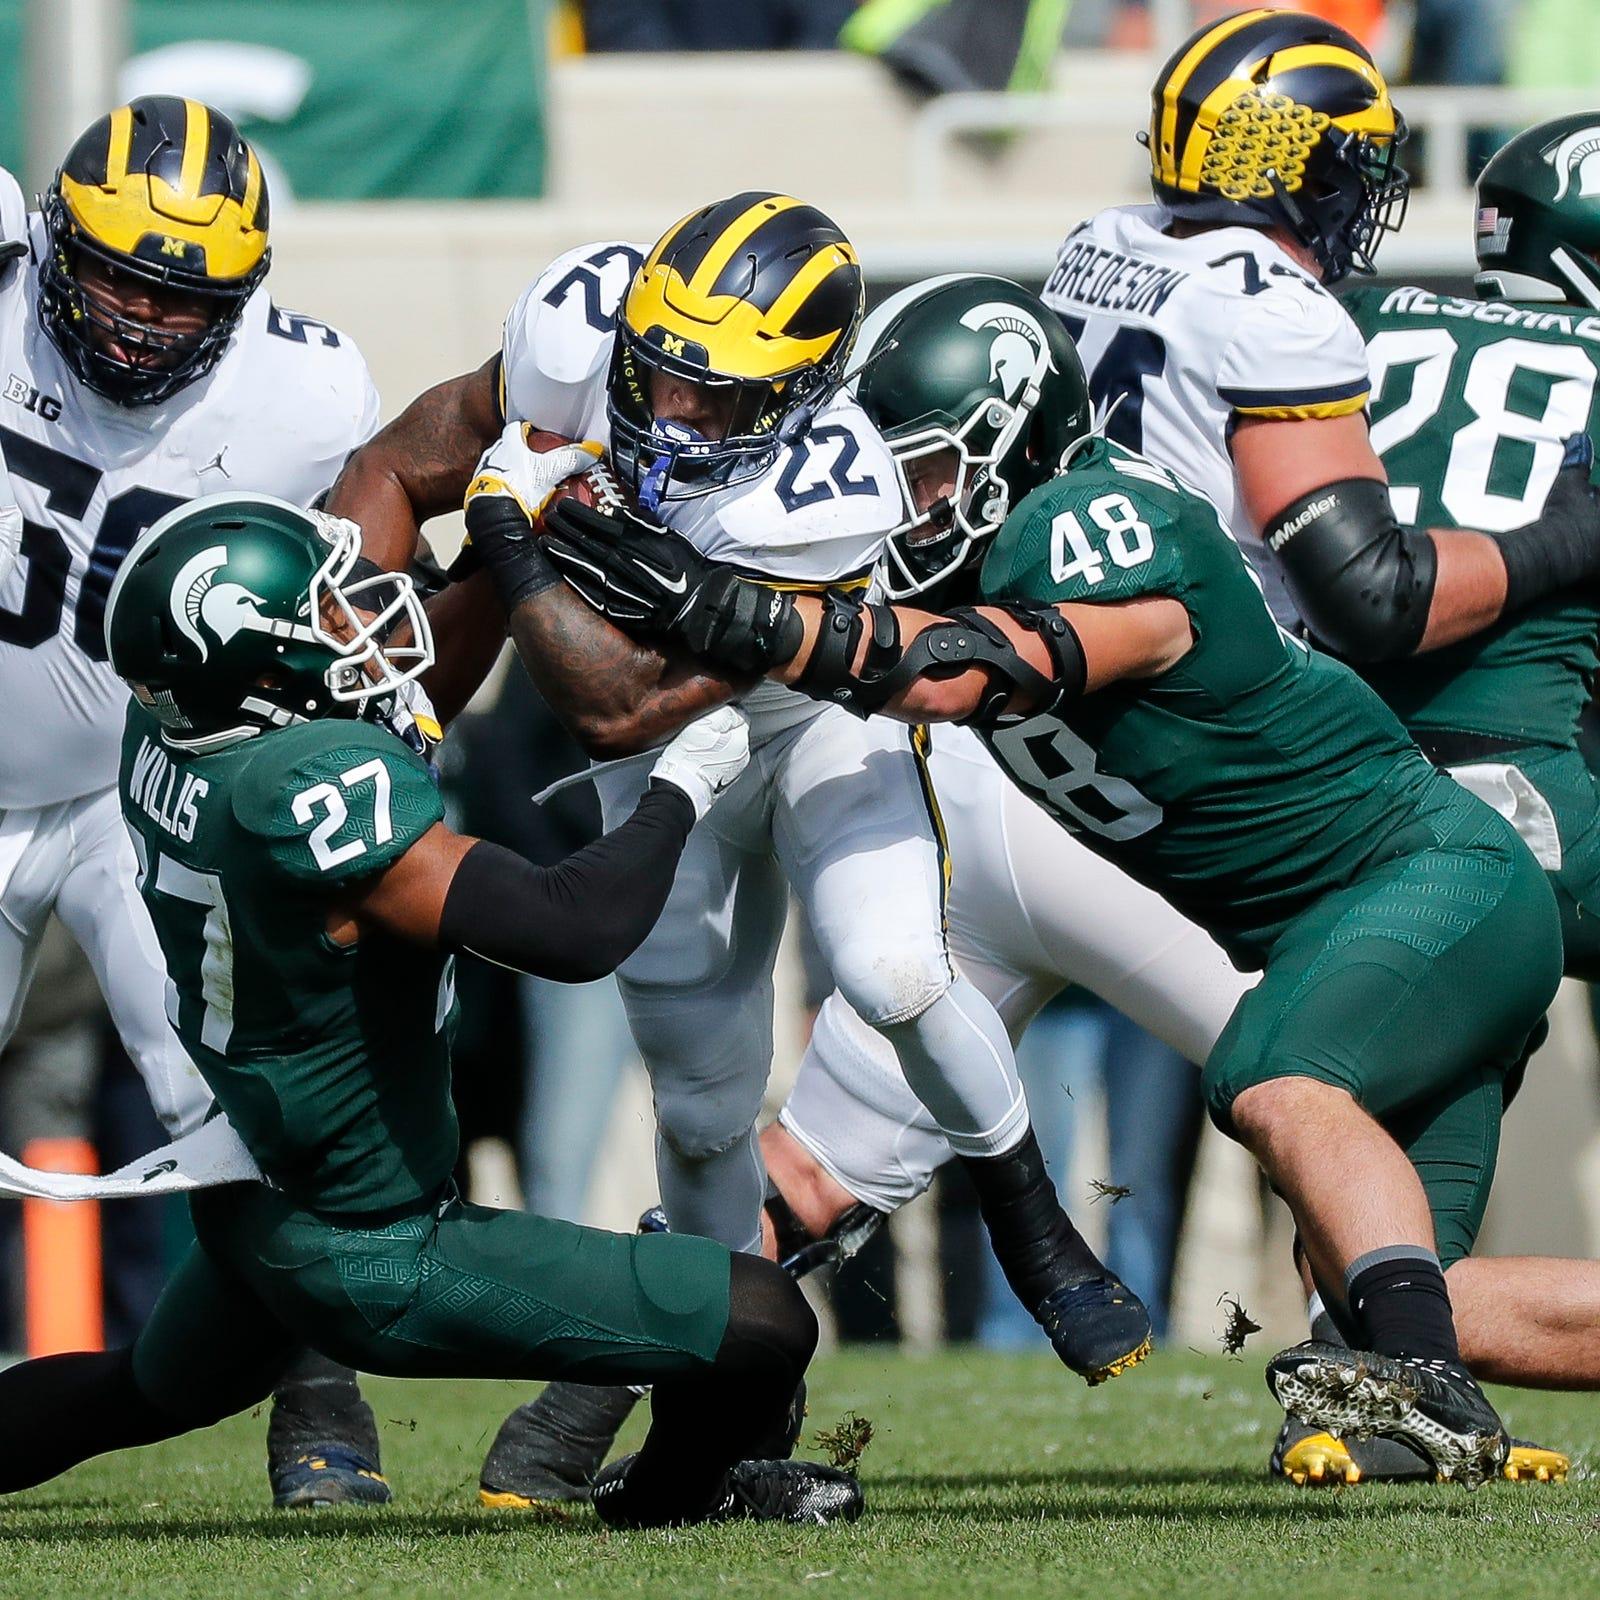 Michigan running back Karan Higdon runs against Michigan State safety Khari Willis, left, and defensive end Kenny Willekes during the first half at Spartan Stadium on Saturday, Oct. 20, 2018.